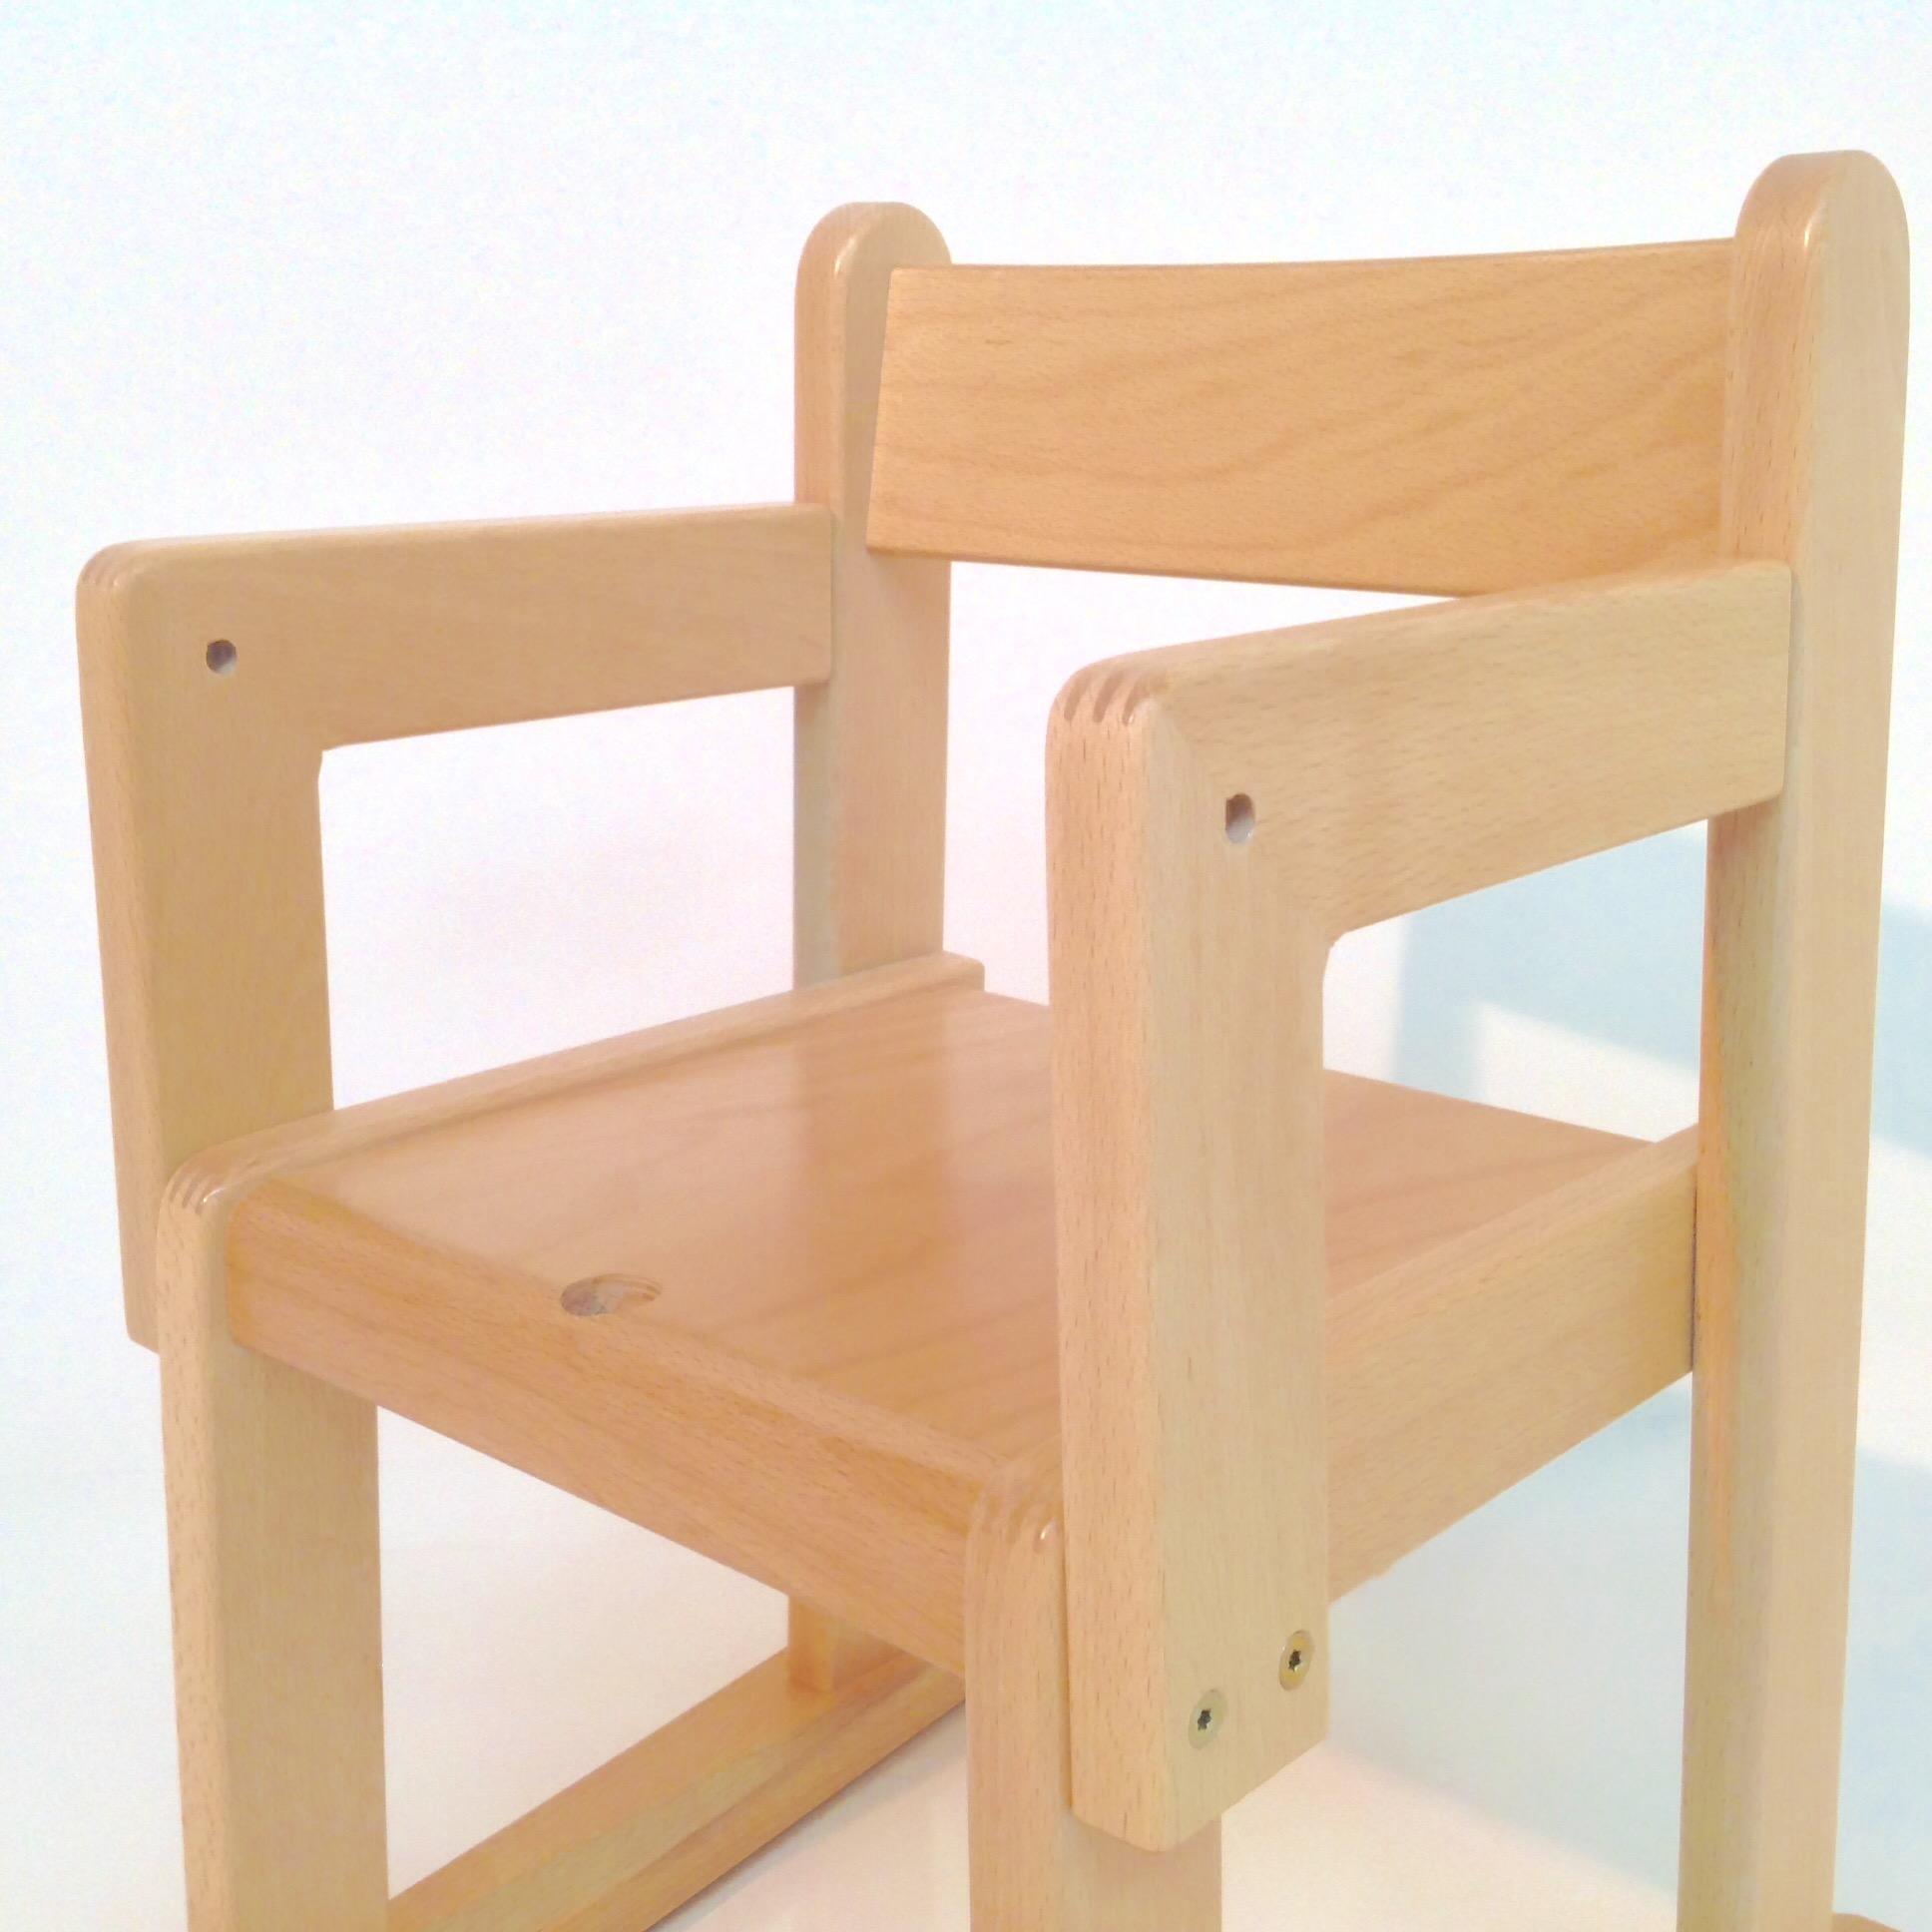 jobaec stuhl kindergartenstuhl kindergarten stuhl stapelstuhl stapel stuhl kinder stuhl. Black Bedroom Furniture Sets. Home Design Ideas